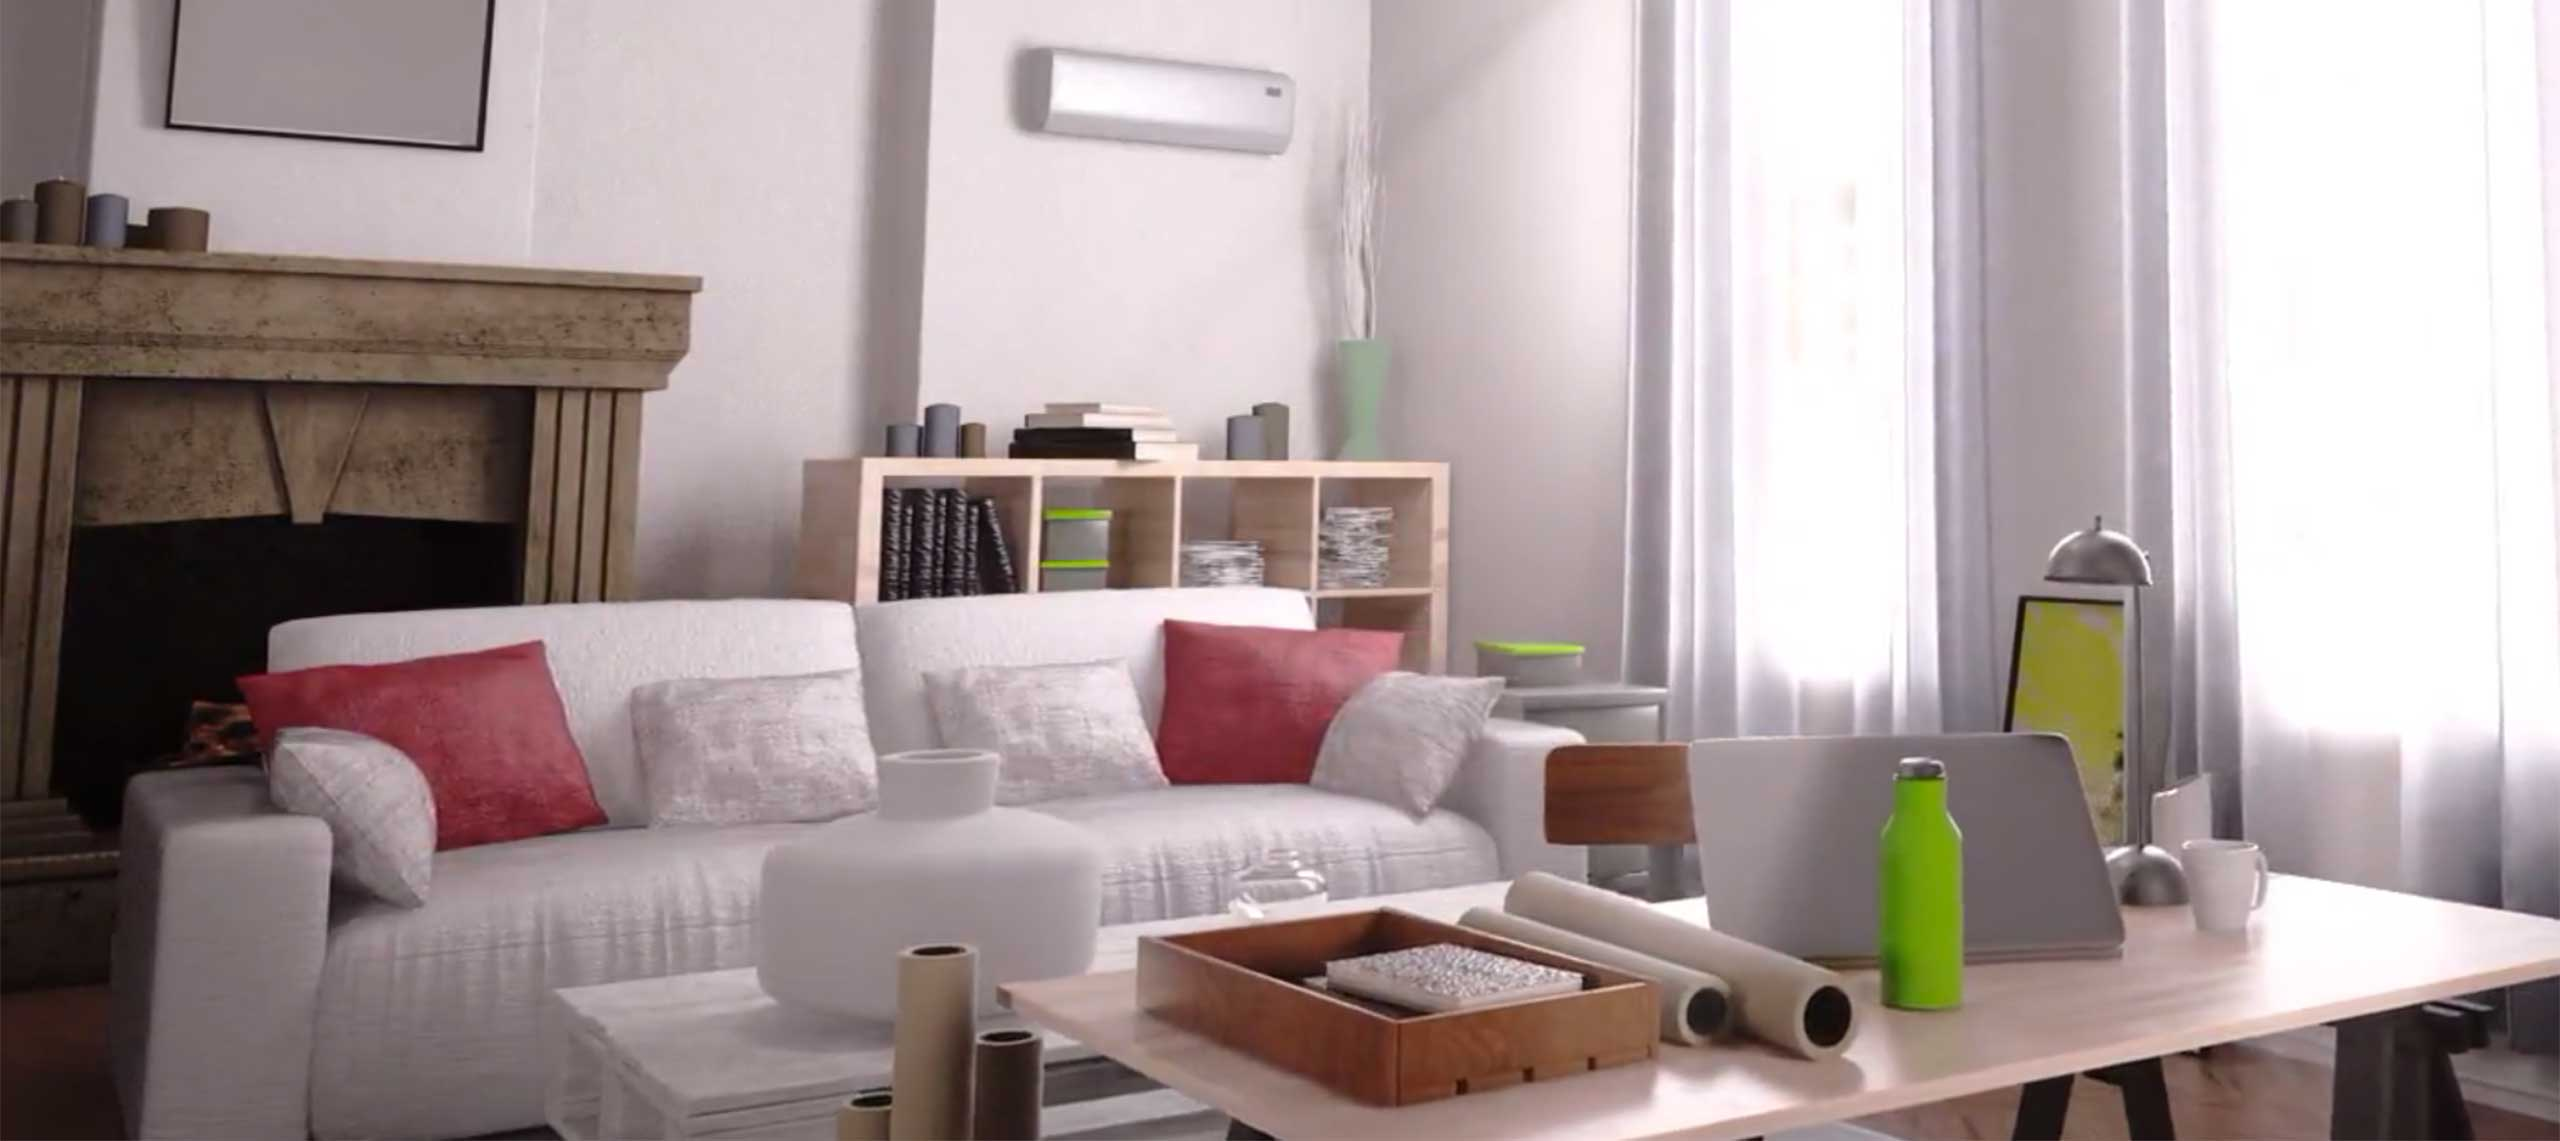 mitsubishi air heating and ductless cooling experts utah hvac mitsibishiductlessac